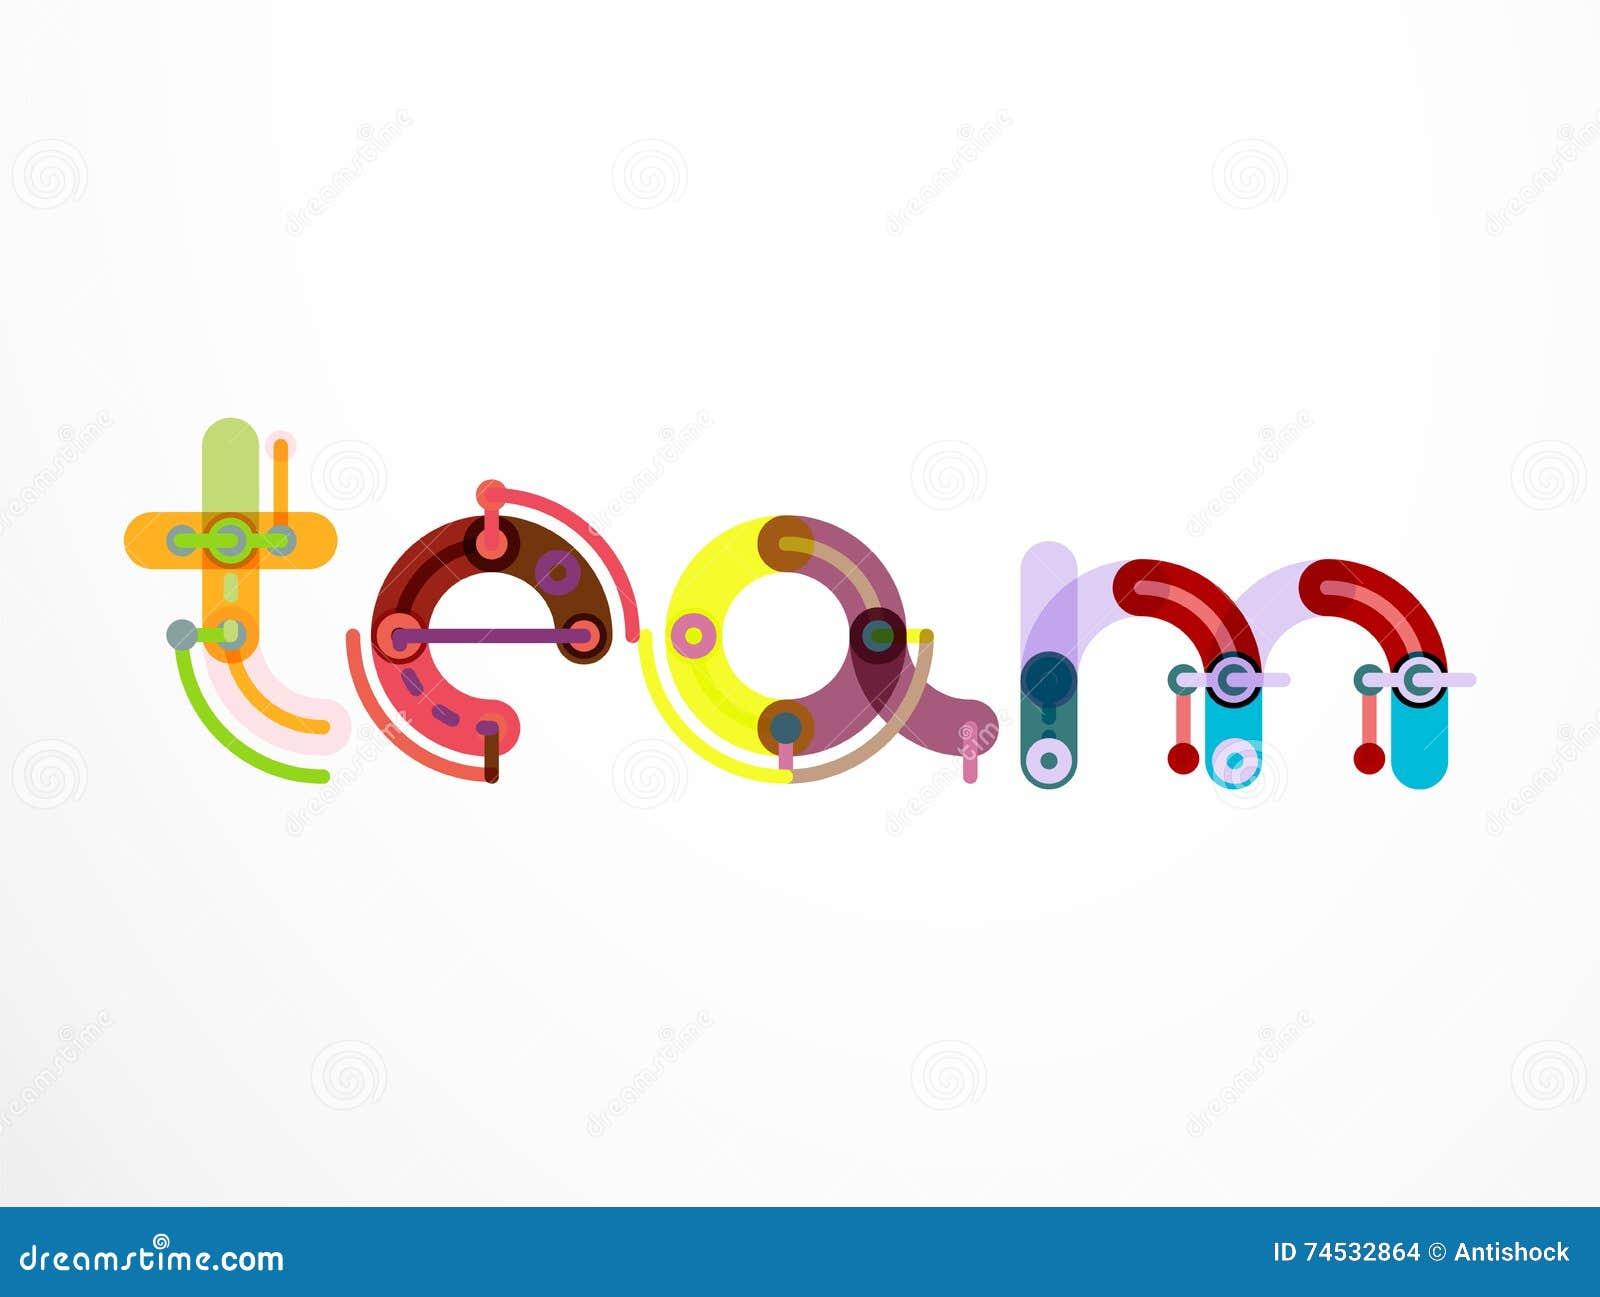 team word lettering banner stock vector illustration of background